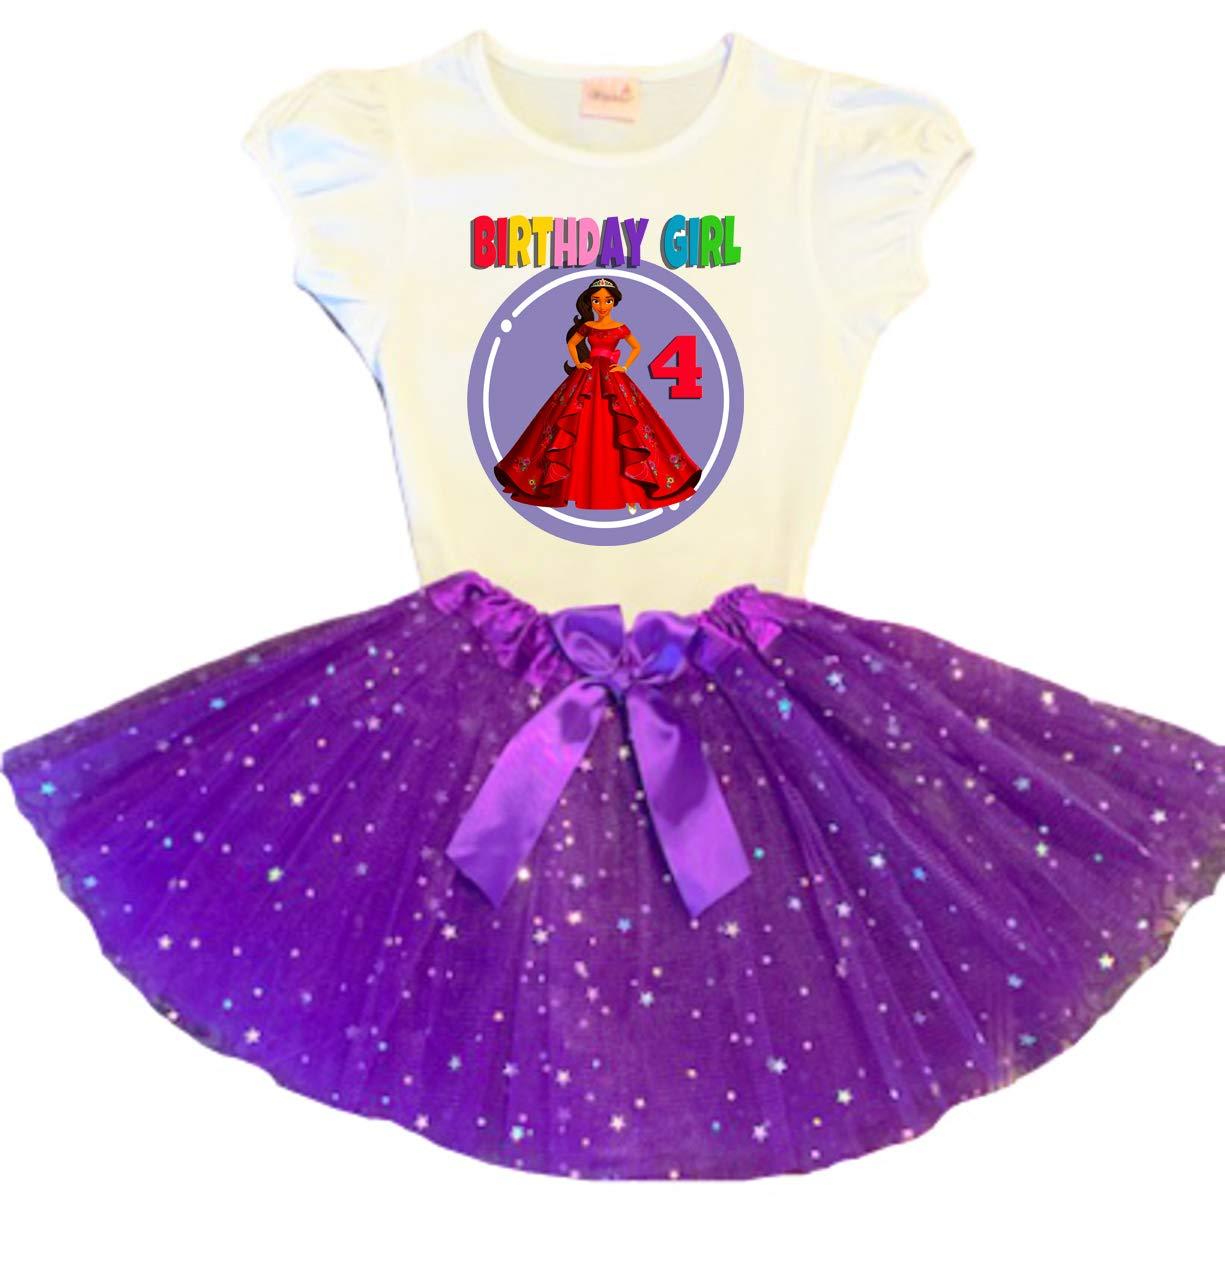 Elena of Avalor Birthday Tutu Tu Indianapolis Mall Finally popular brand Purple 4th Dress Party